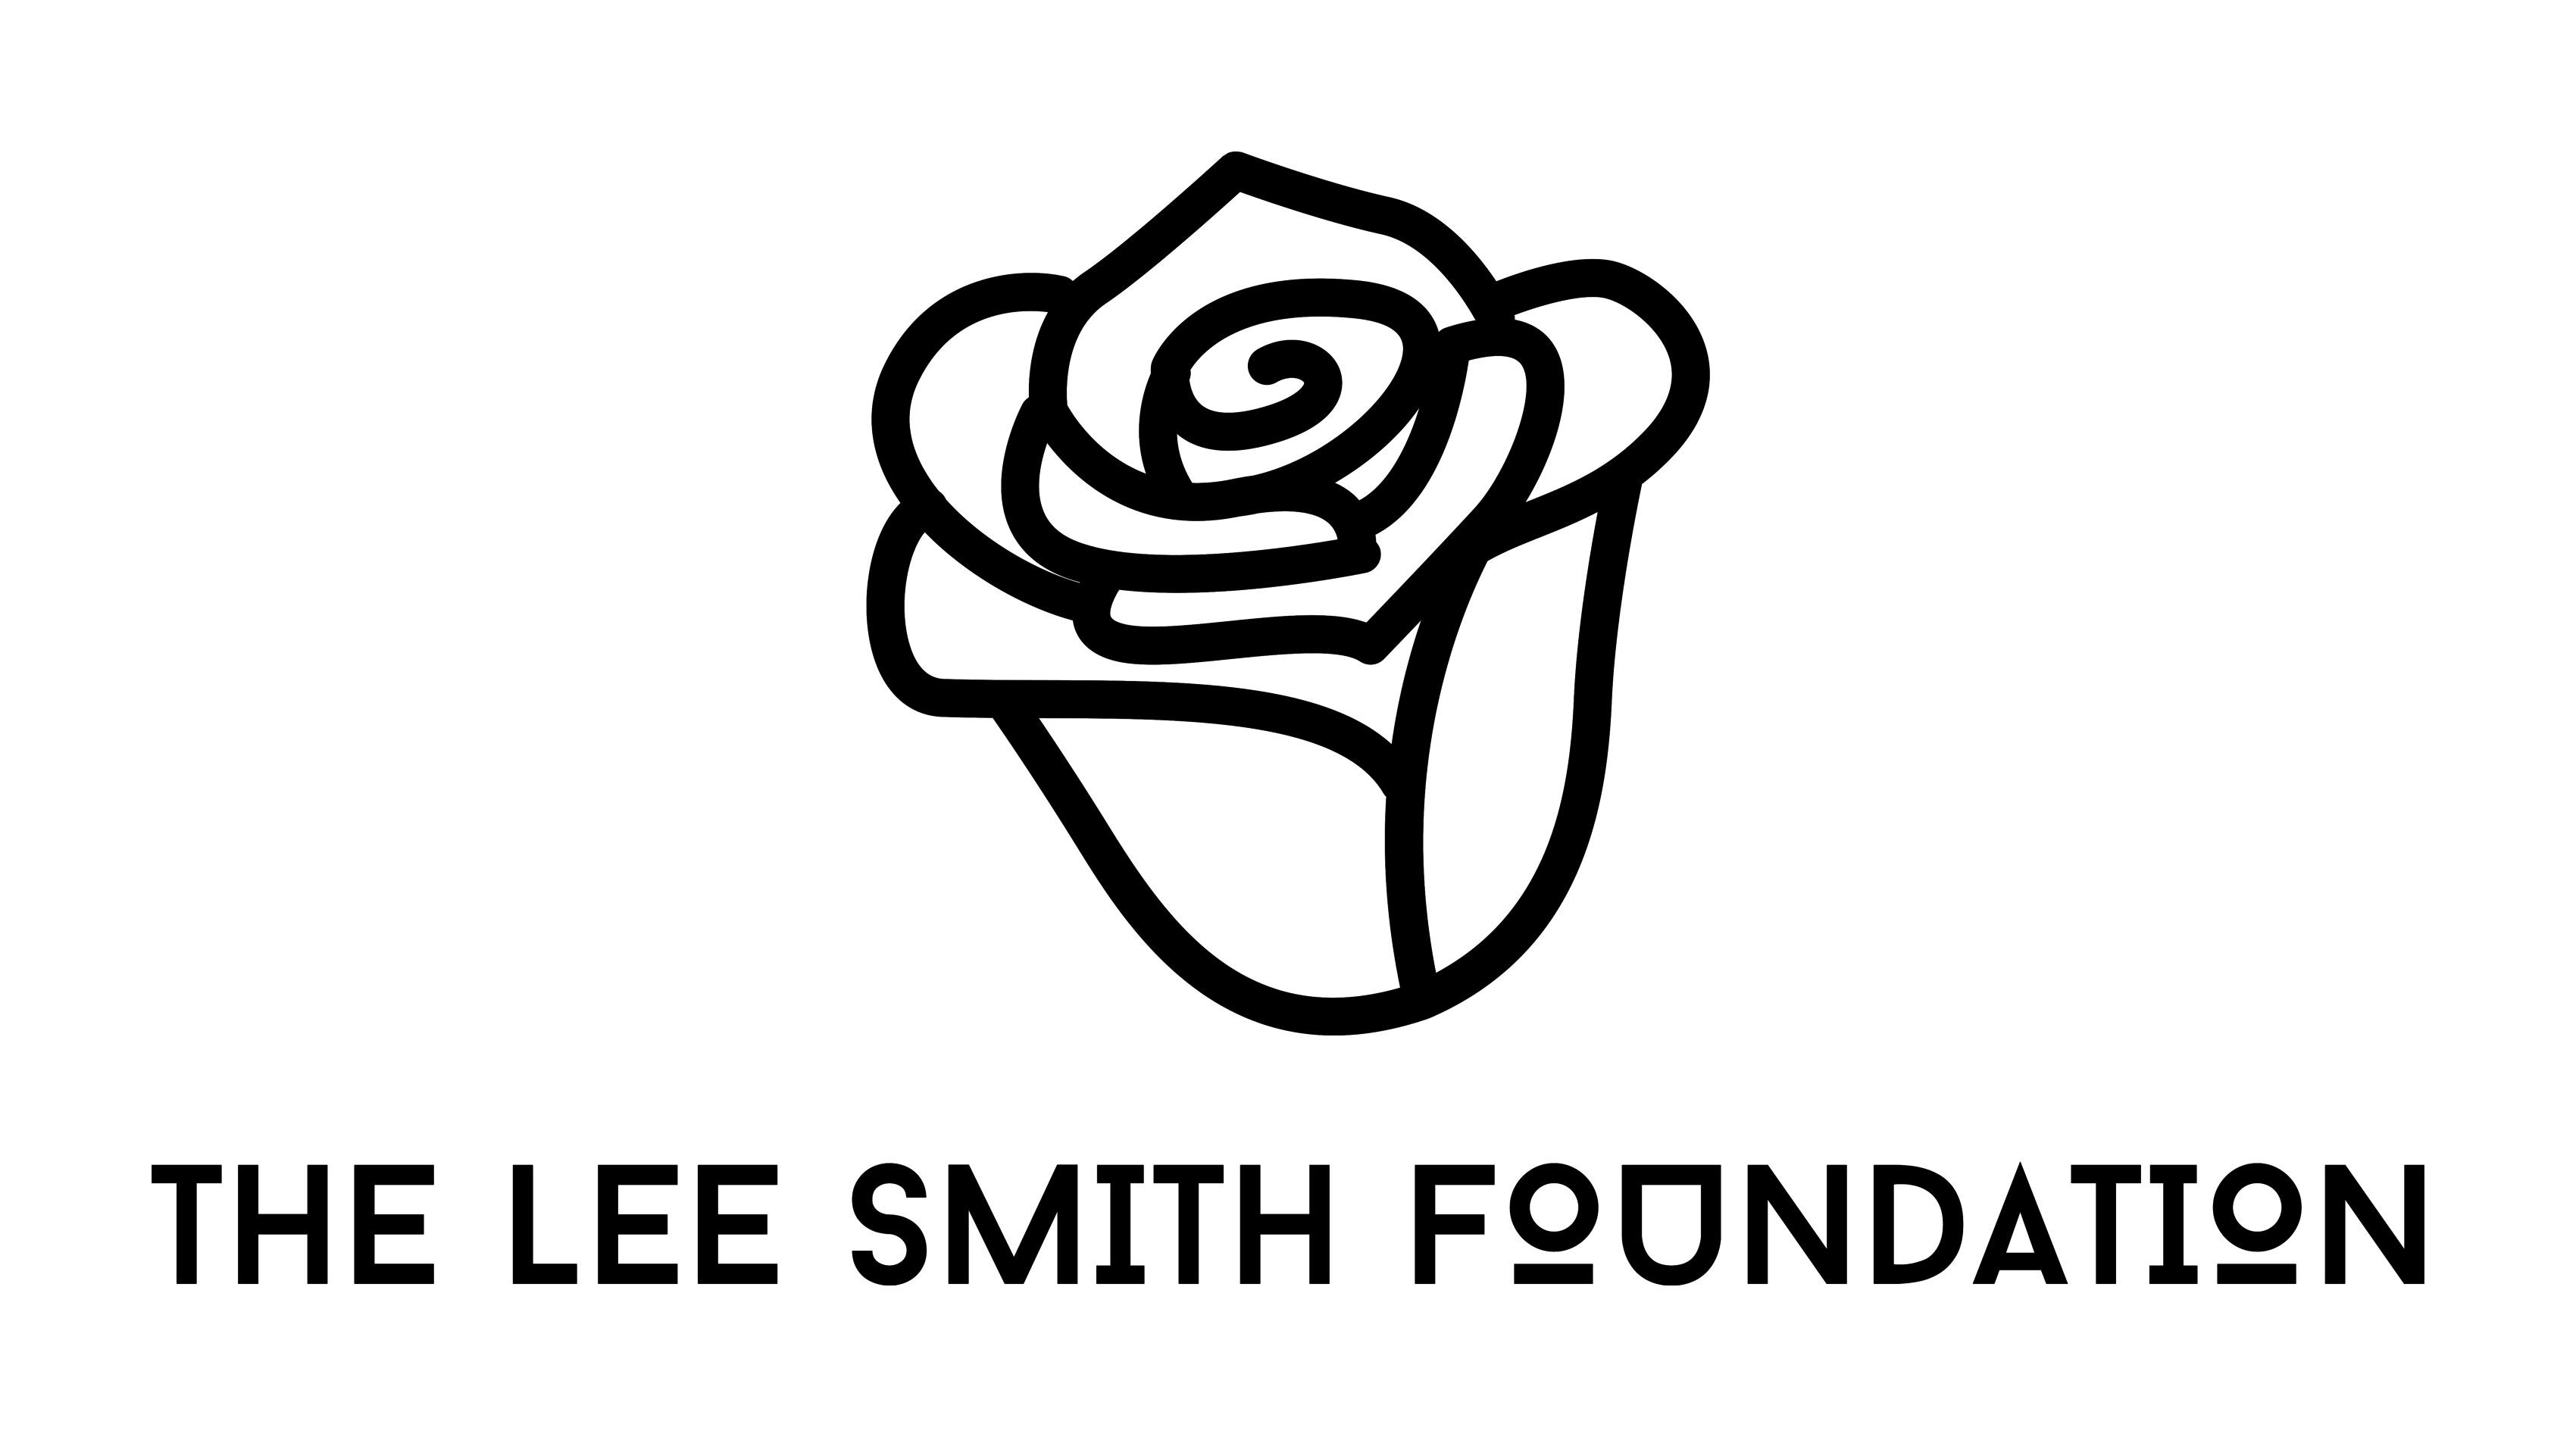 Lee Smith Foundationjpg